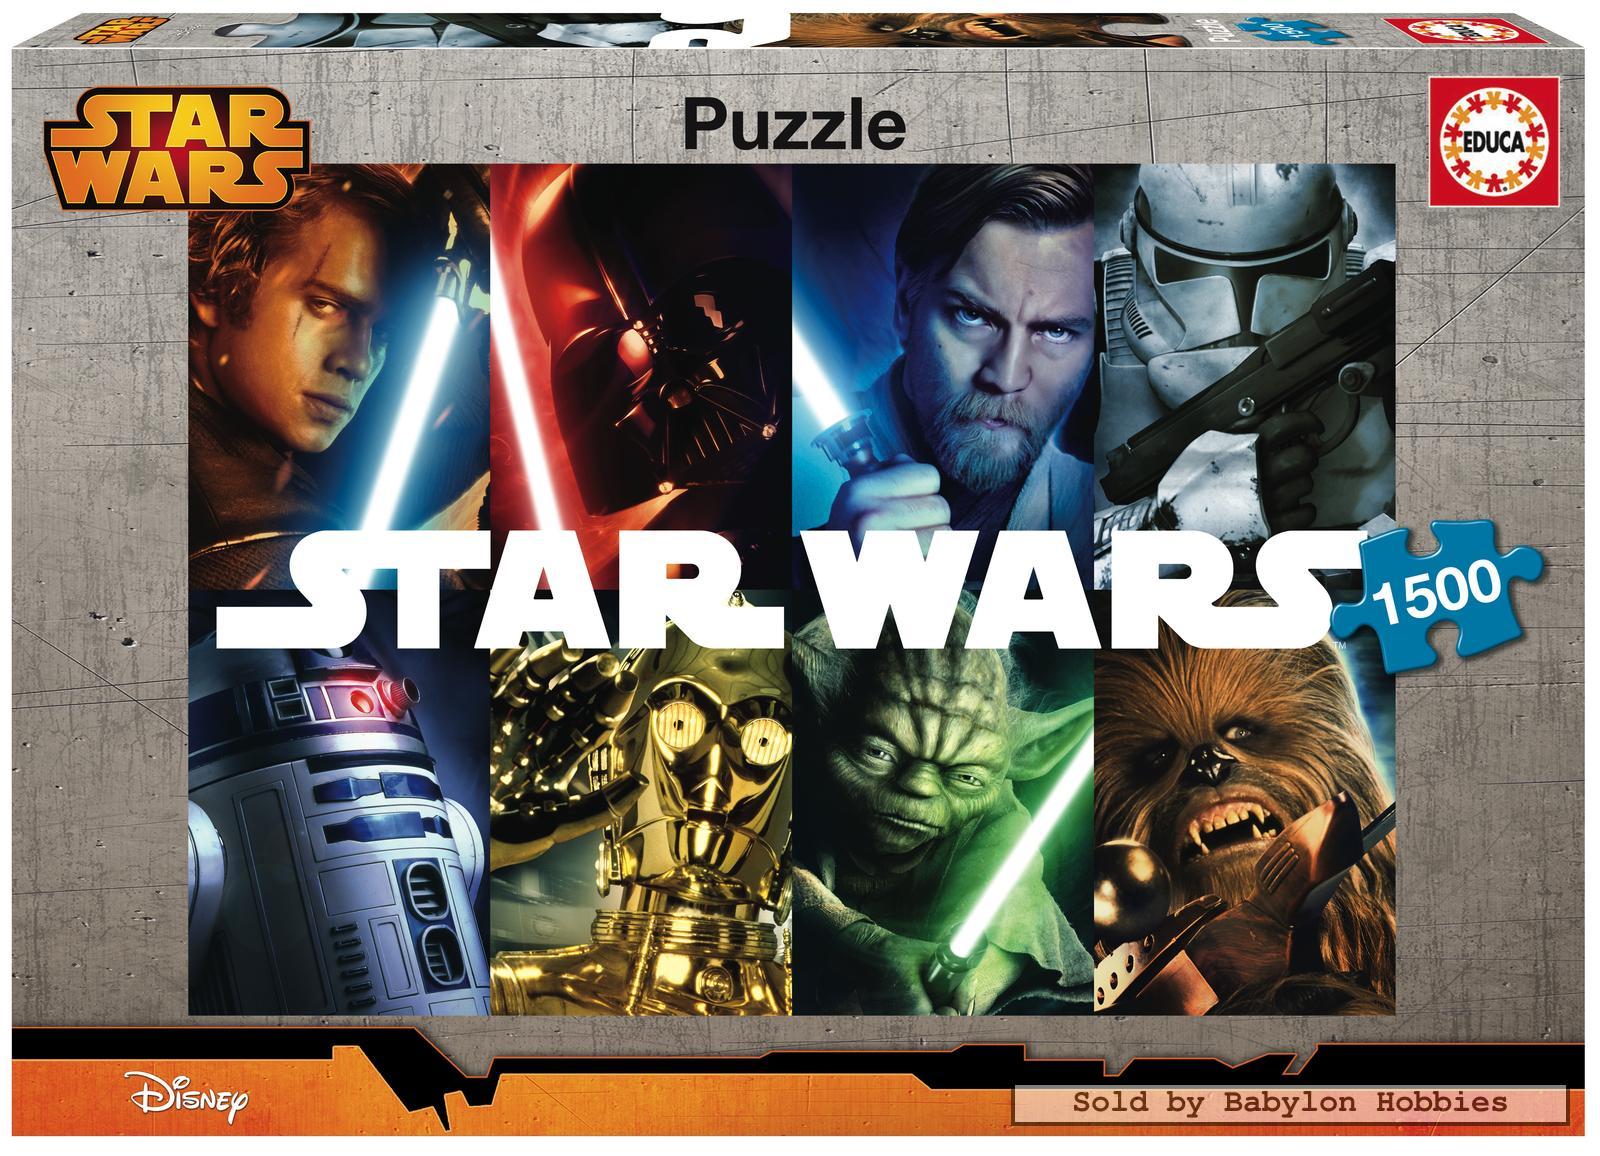 1500 pcs jigsaw puzzle star wars star wars legends educa 16312 ebay. Black Bedroom Furniture Sets. Home Design Ideas